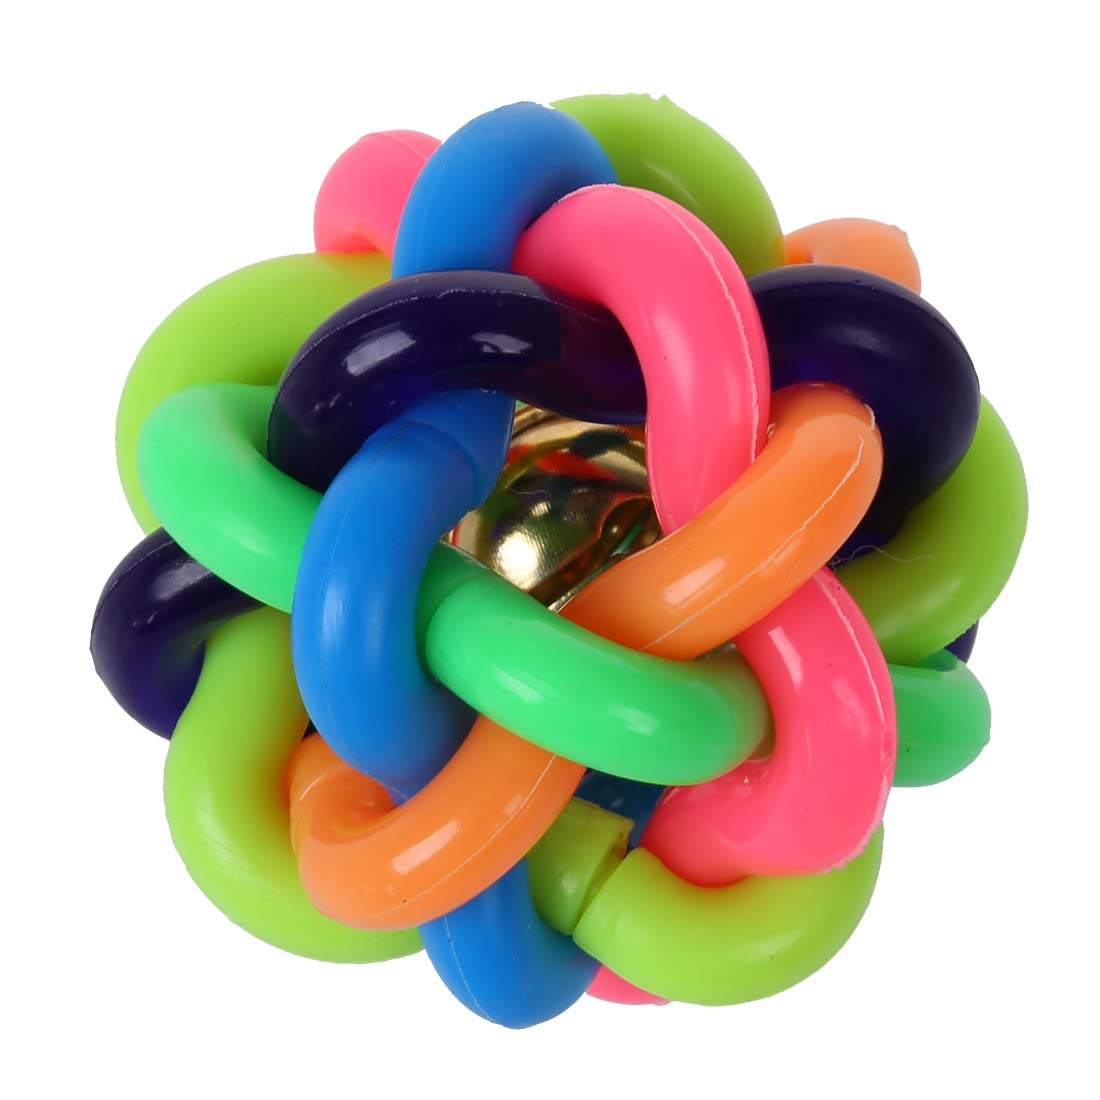 Arco iris de goma bola para mascotas de bell del juguete for Bola juguete